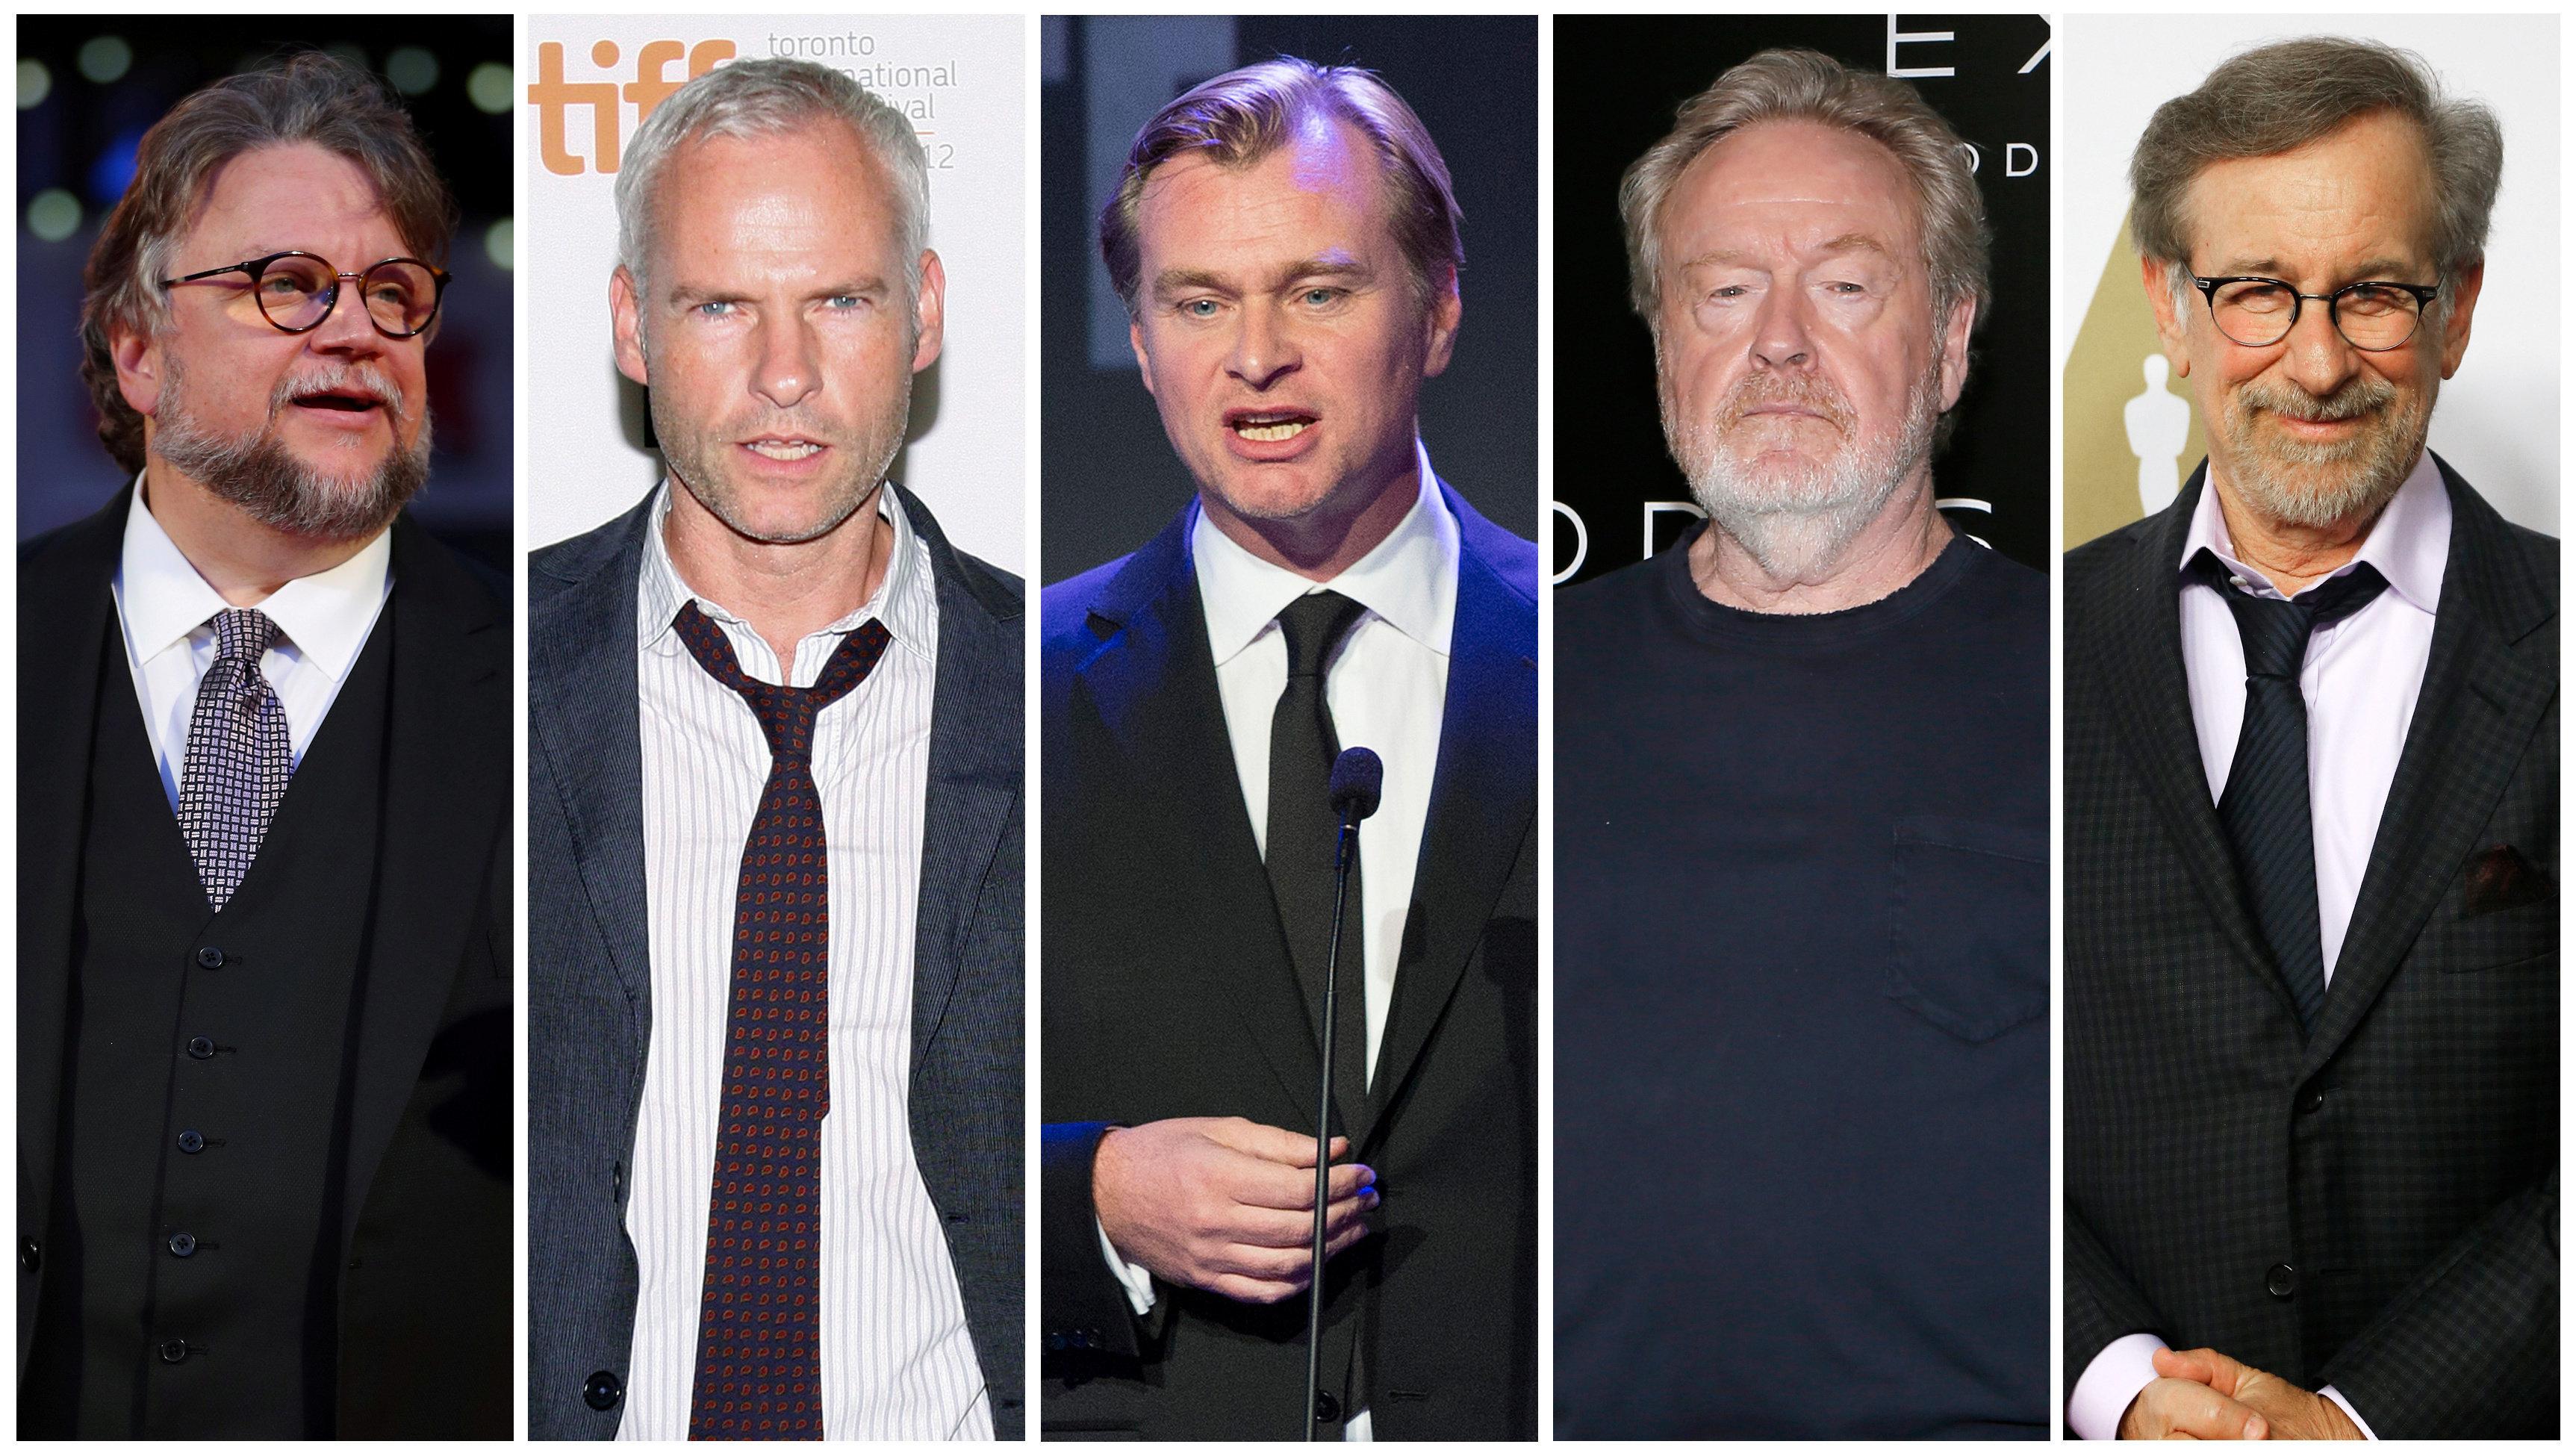 50 shades of beige: Guillermo del Toro, Martin McDonagh, Christopher Nolan, Ridley Scott and Steven Spielberg, who are all no